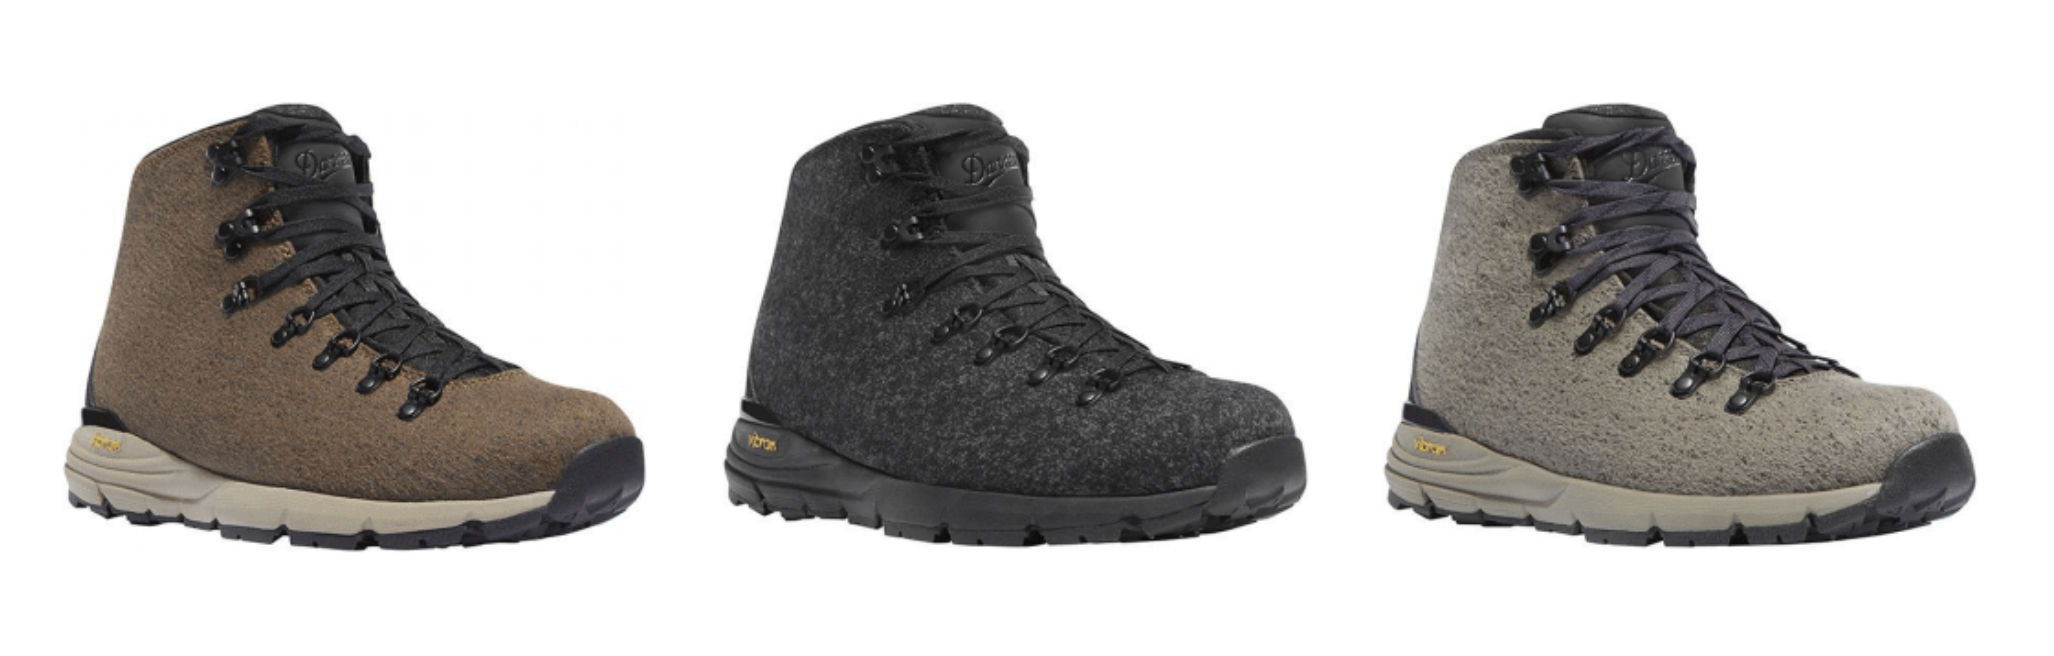 37aafc26532 Mountain Tested Mondays: Danner Explorer 650 Hiking Boot